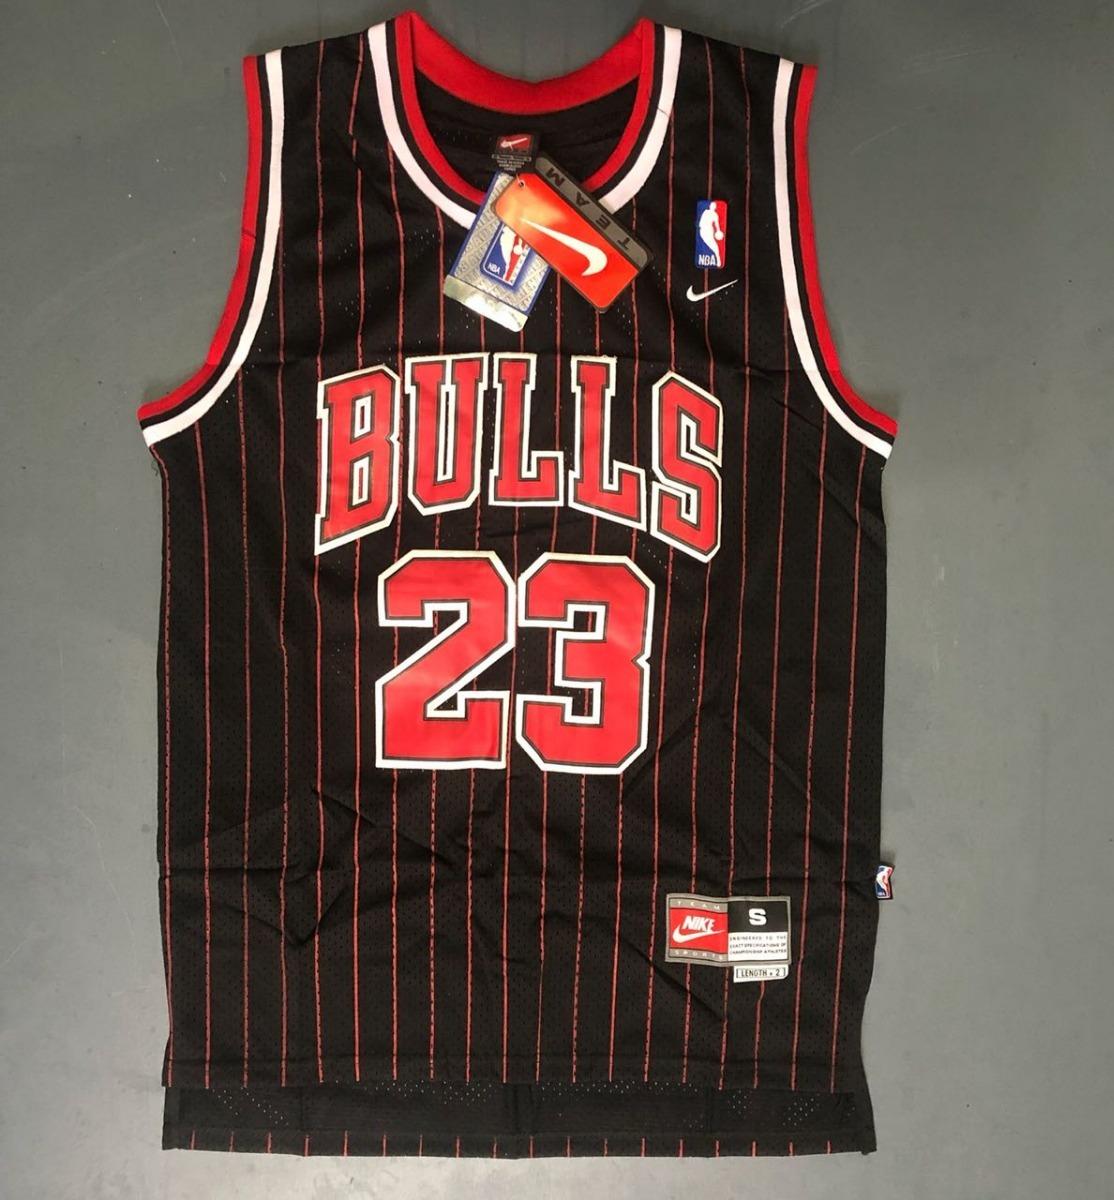 regata nike basquete - chicago bulls - jordan 23 original. Carregando zoom. 416b05793ff